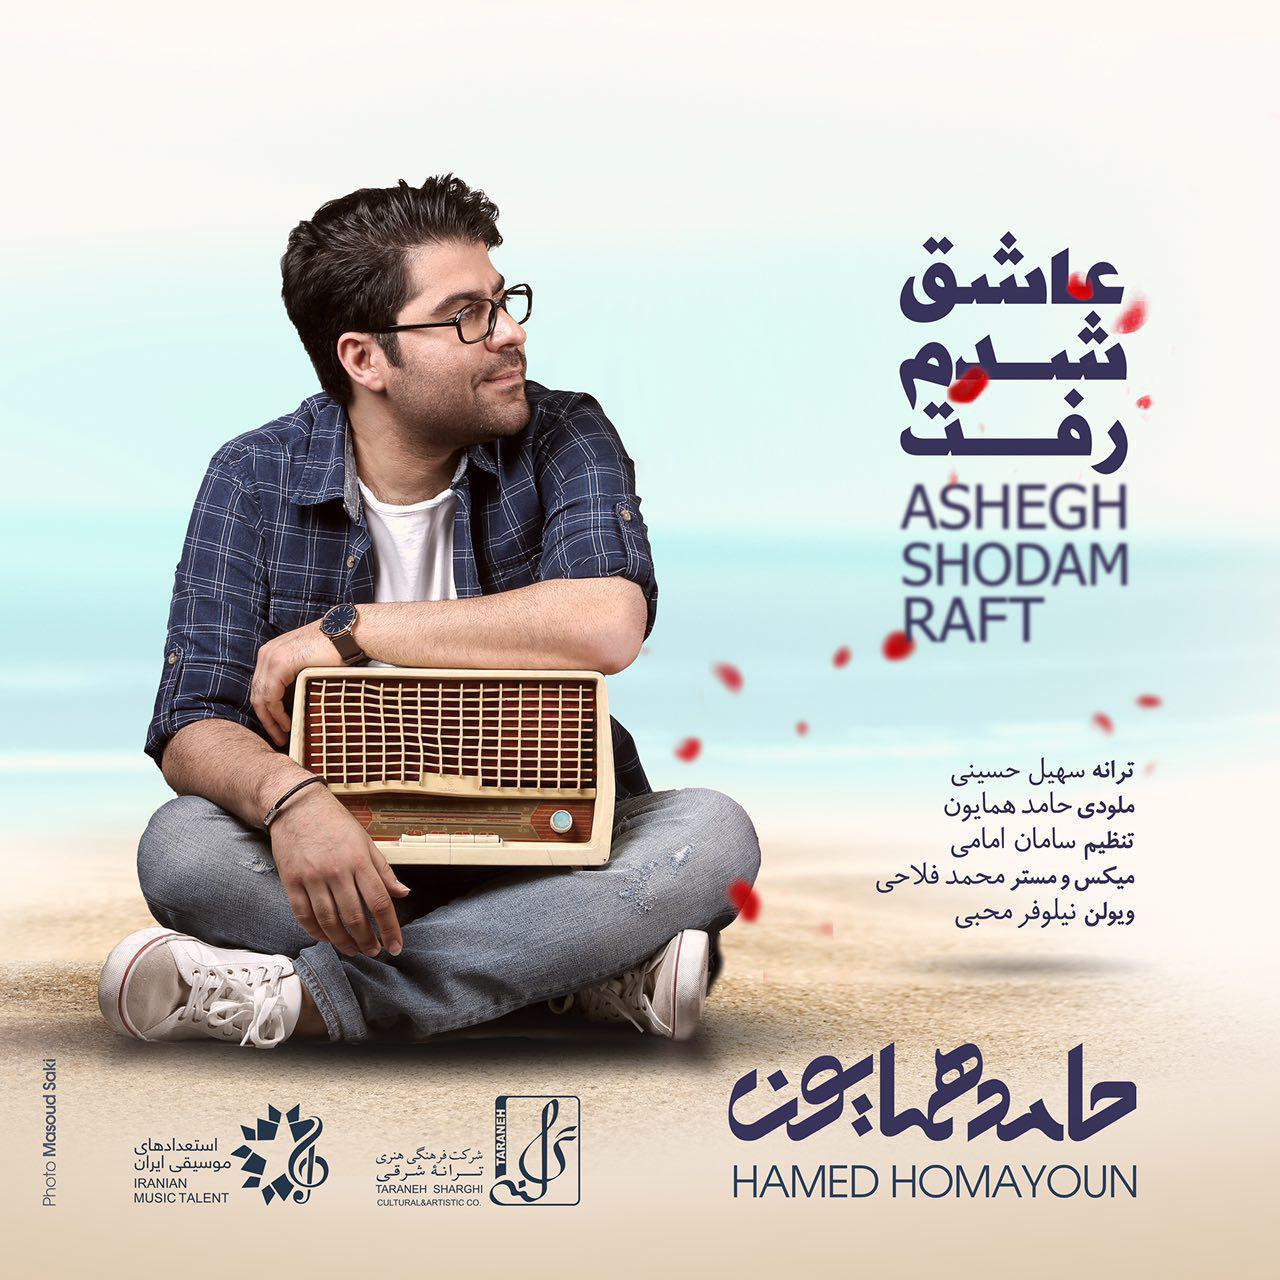 Ashegh Shodam Raft